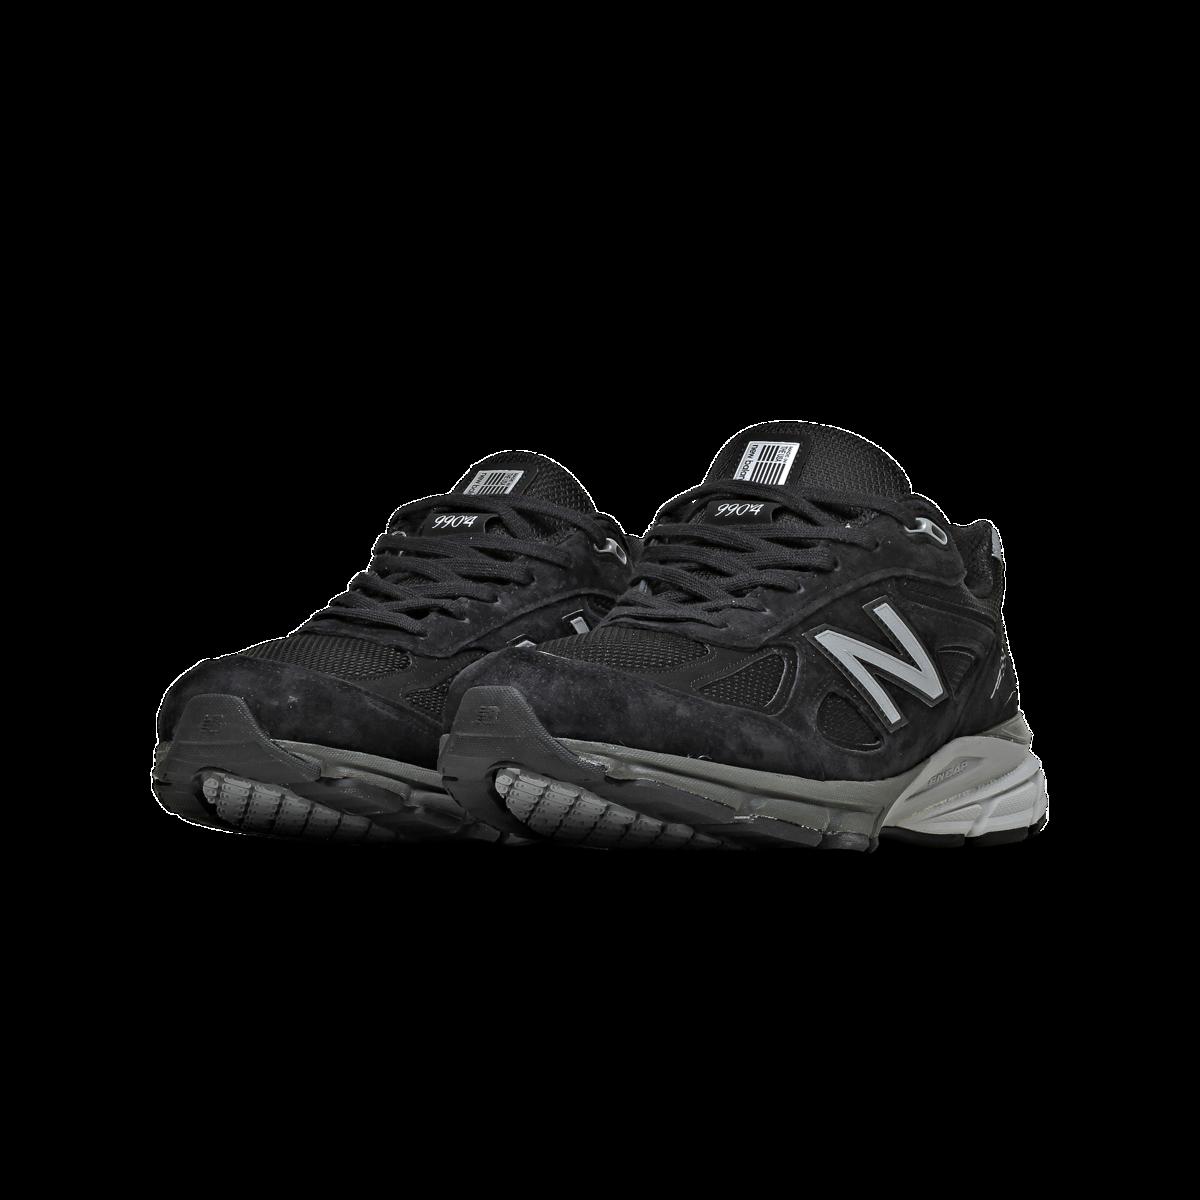 on sale 02998 bb67d Buy New Balance 990BK4 - Black   M990BK4